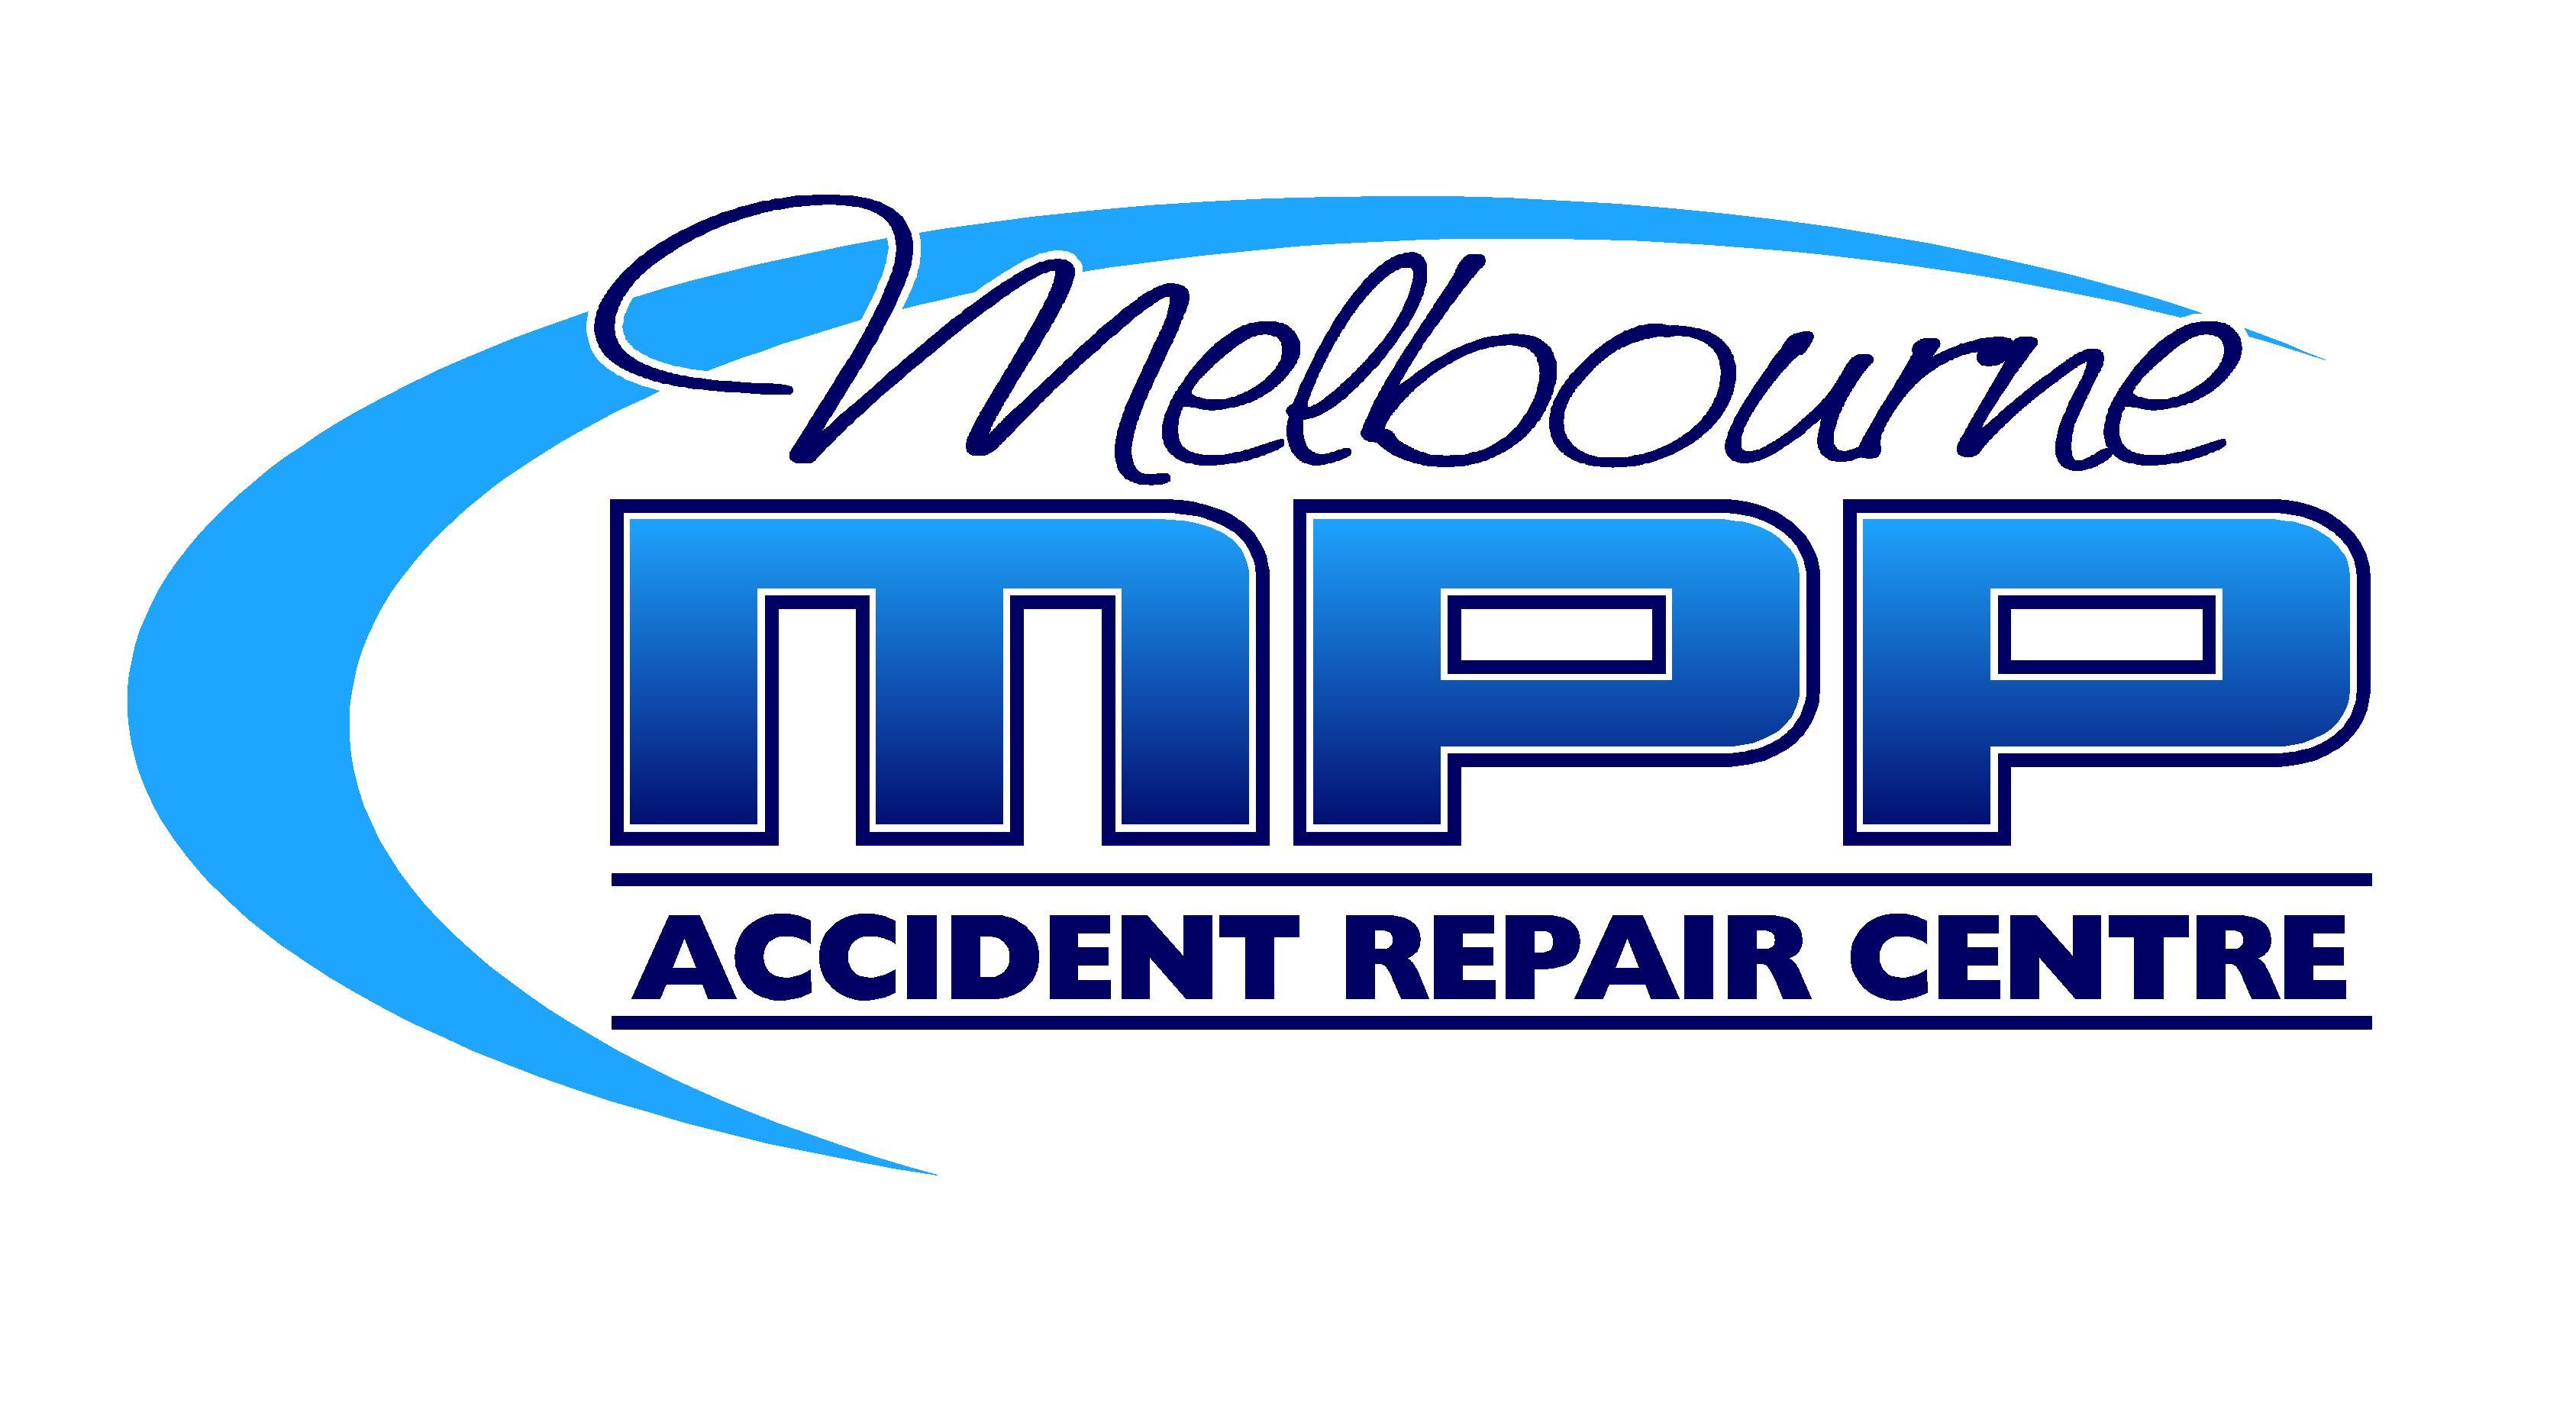 Melbourne MPP Accident Repair Centre Logo